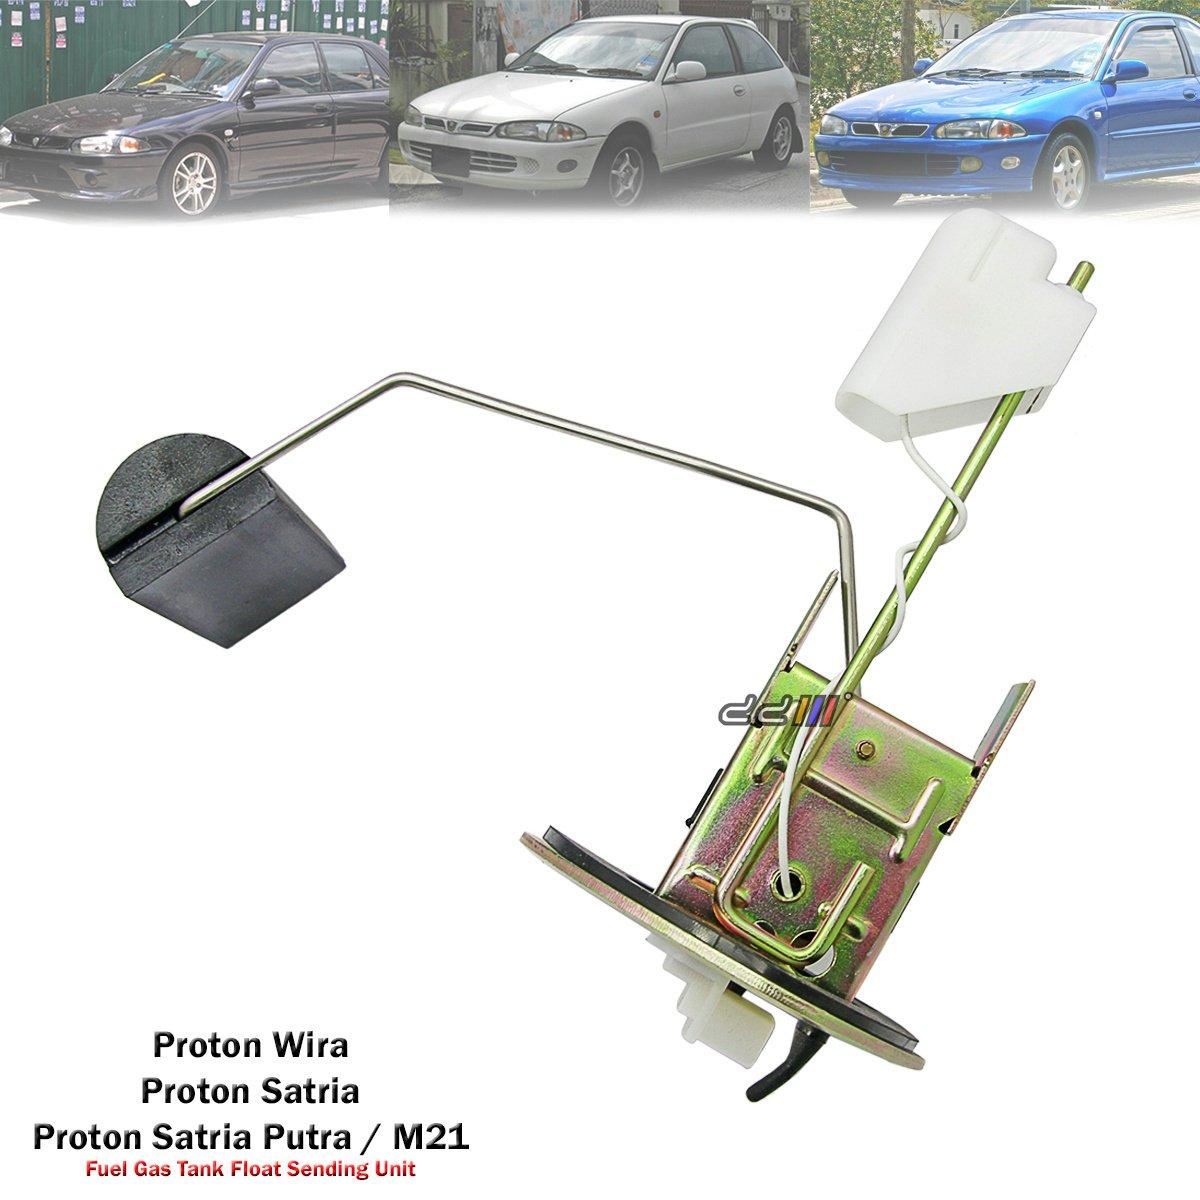 Fuel Gas Tank Float Sending Unit For Proton Wira Satria Wiring Diagram M21 Coupe Pw510680 Automotive